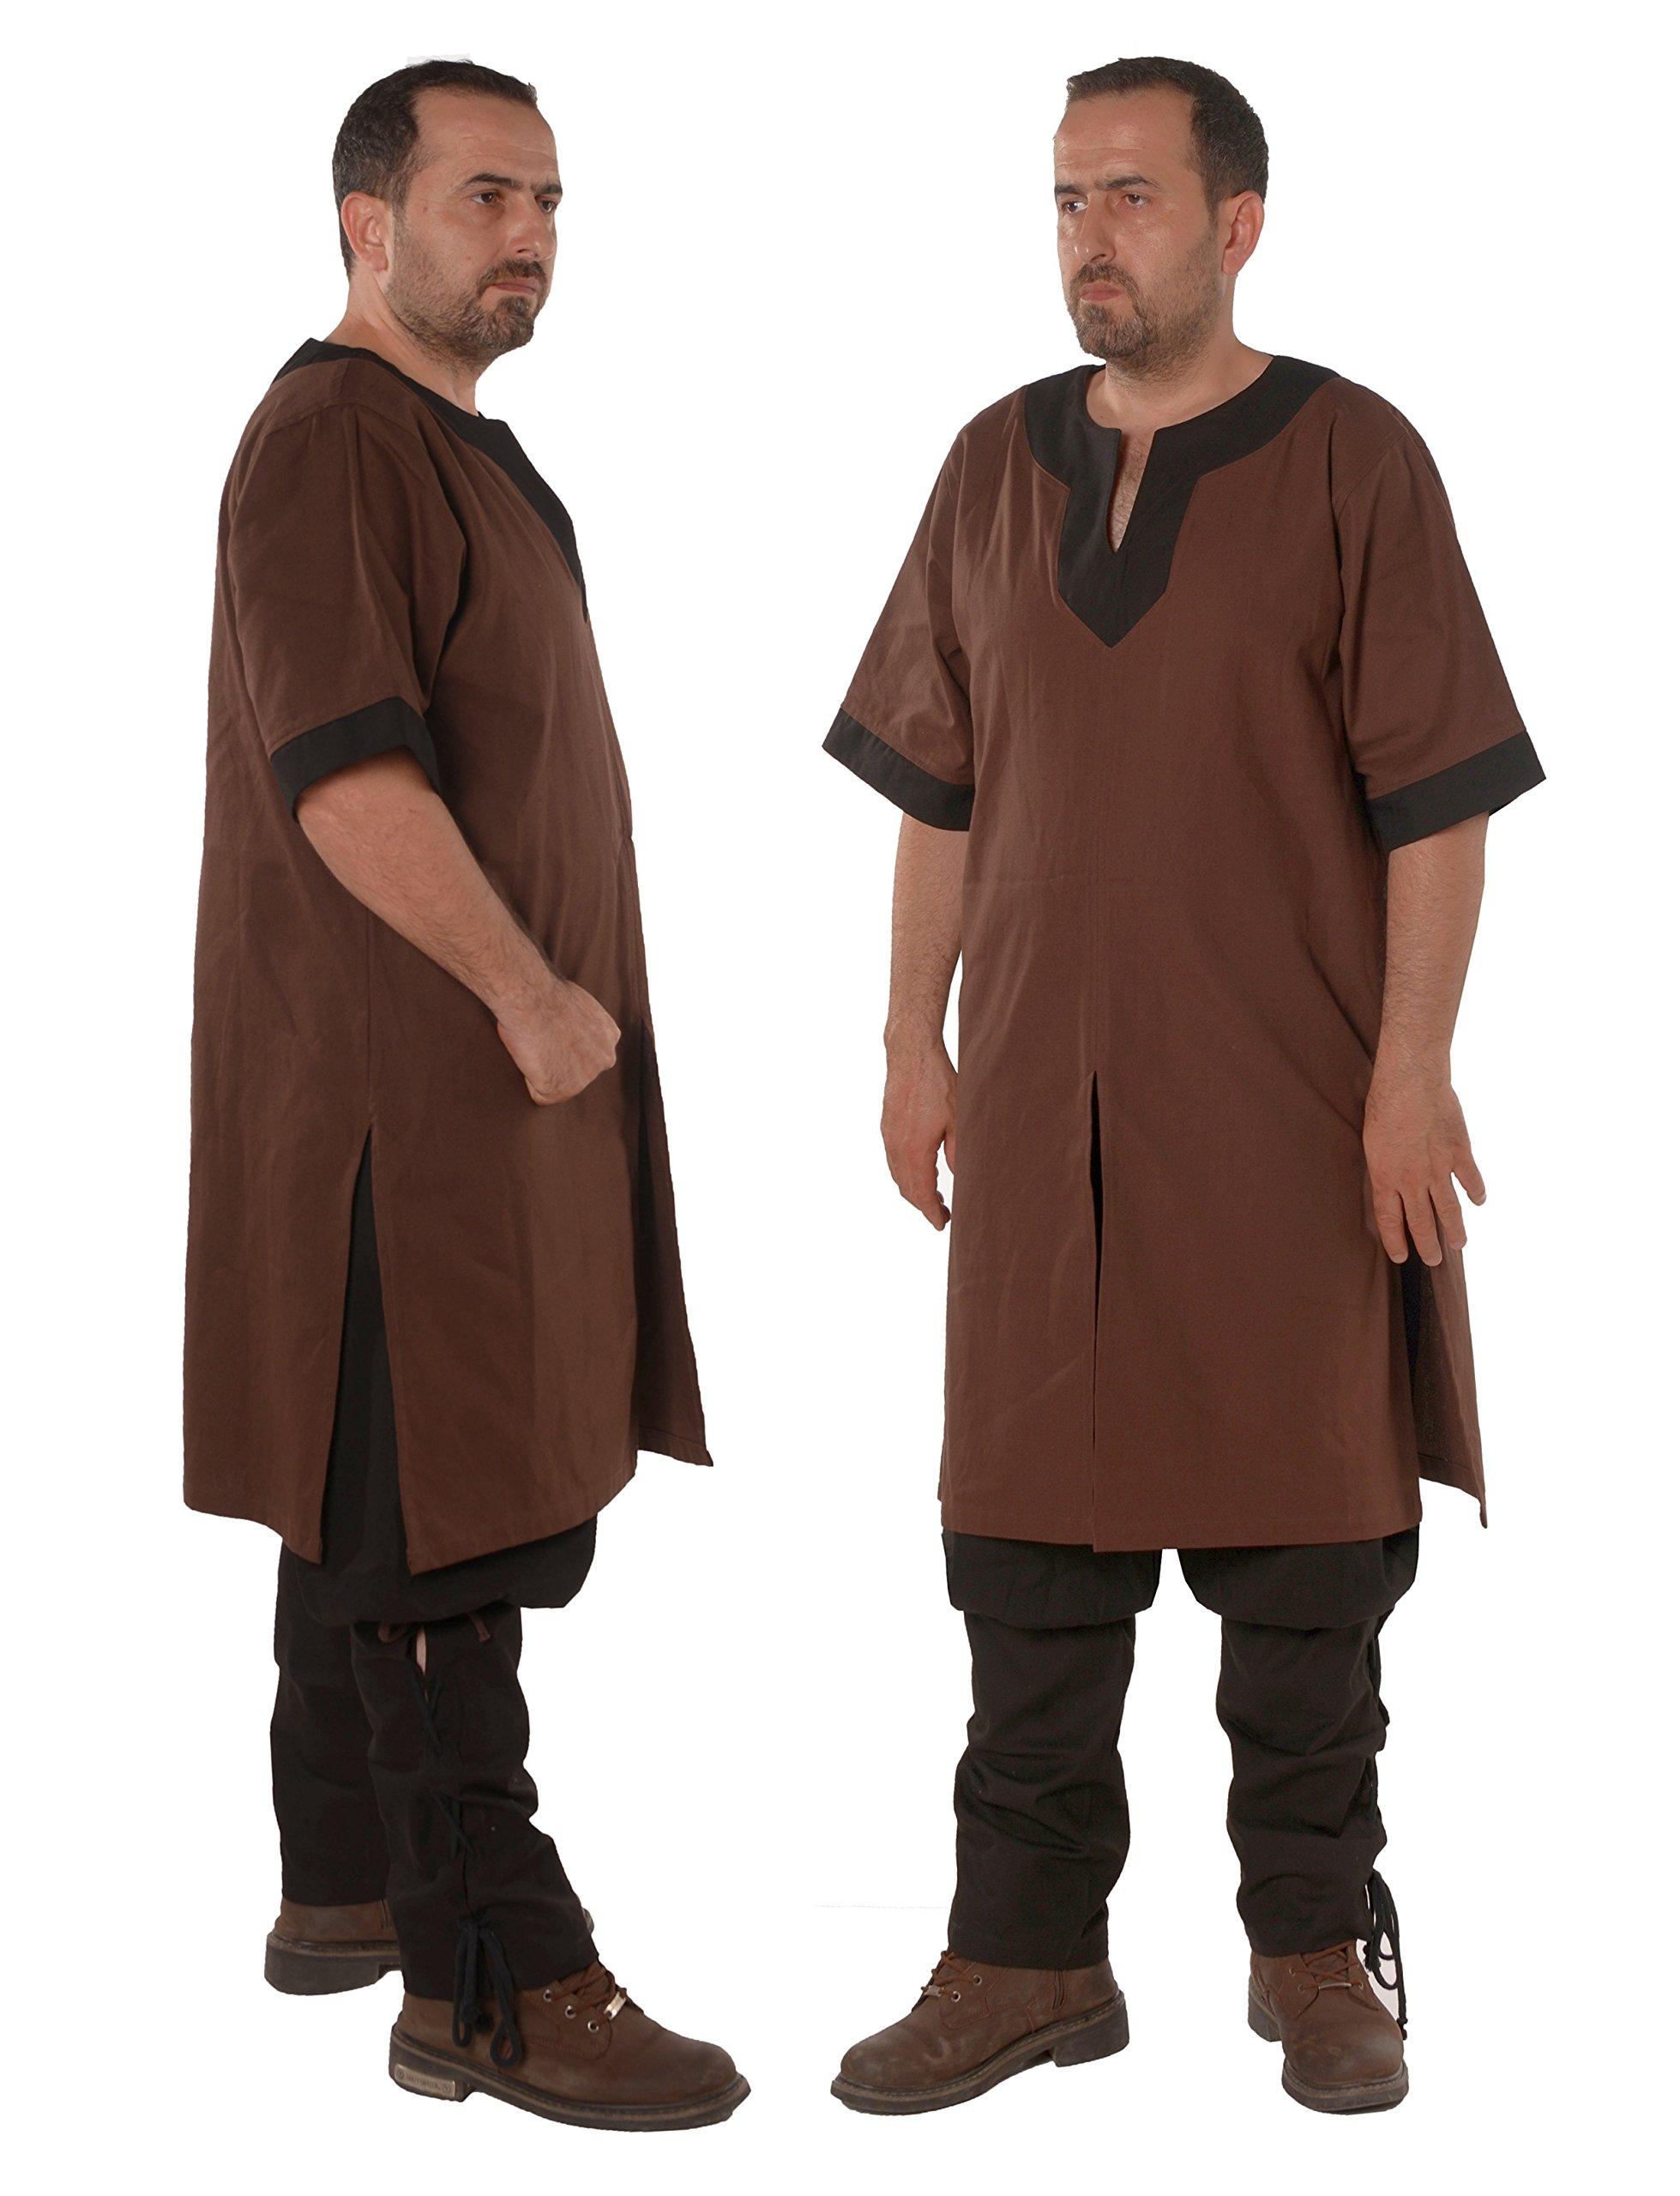 byCalvina - Calvina Costumes Loki Medieval Viking LARP Renaissance Linen-Look Cotton Mens Tunic-Made in Turkey -BRW/BLC XXXL